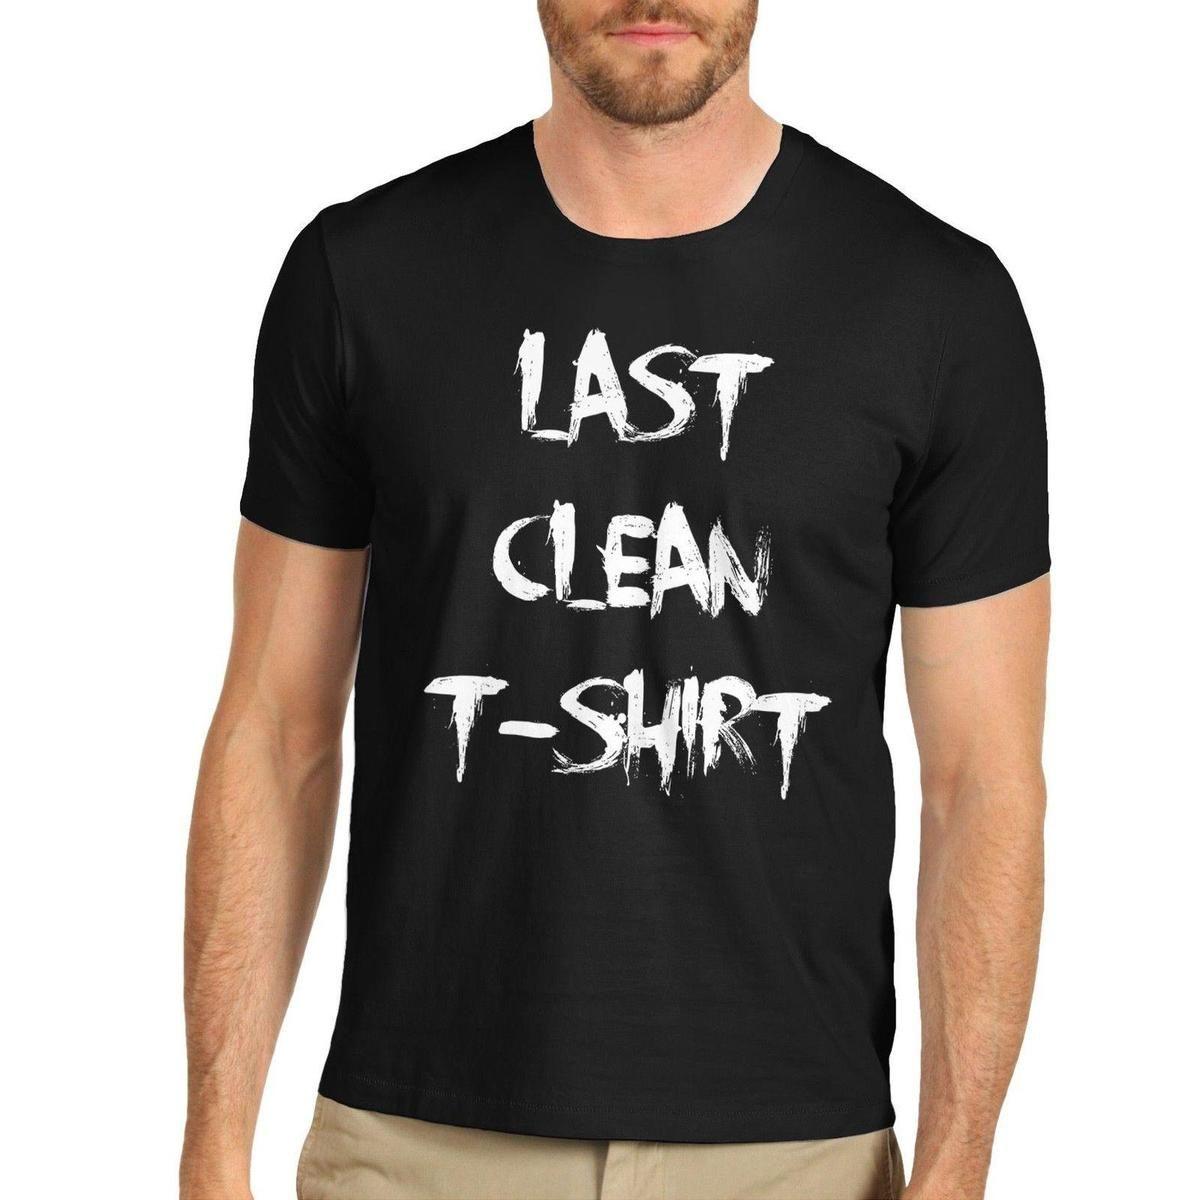 a86894912 Men's Last Clean T-Shirt Funny Slogan T-Shirt Men Funny O Neck Short Sleeve  Cotton T-Shirt New Fashion Print Free Shipping